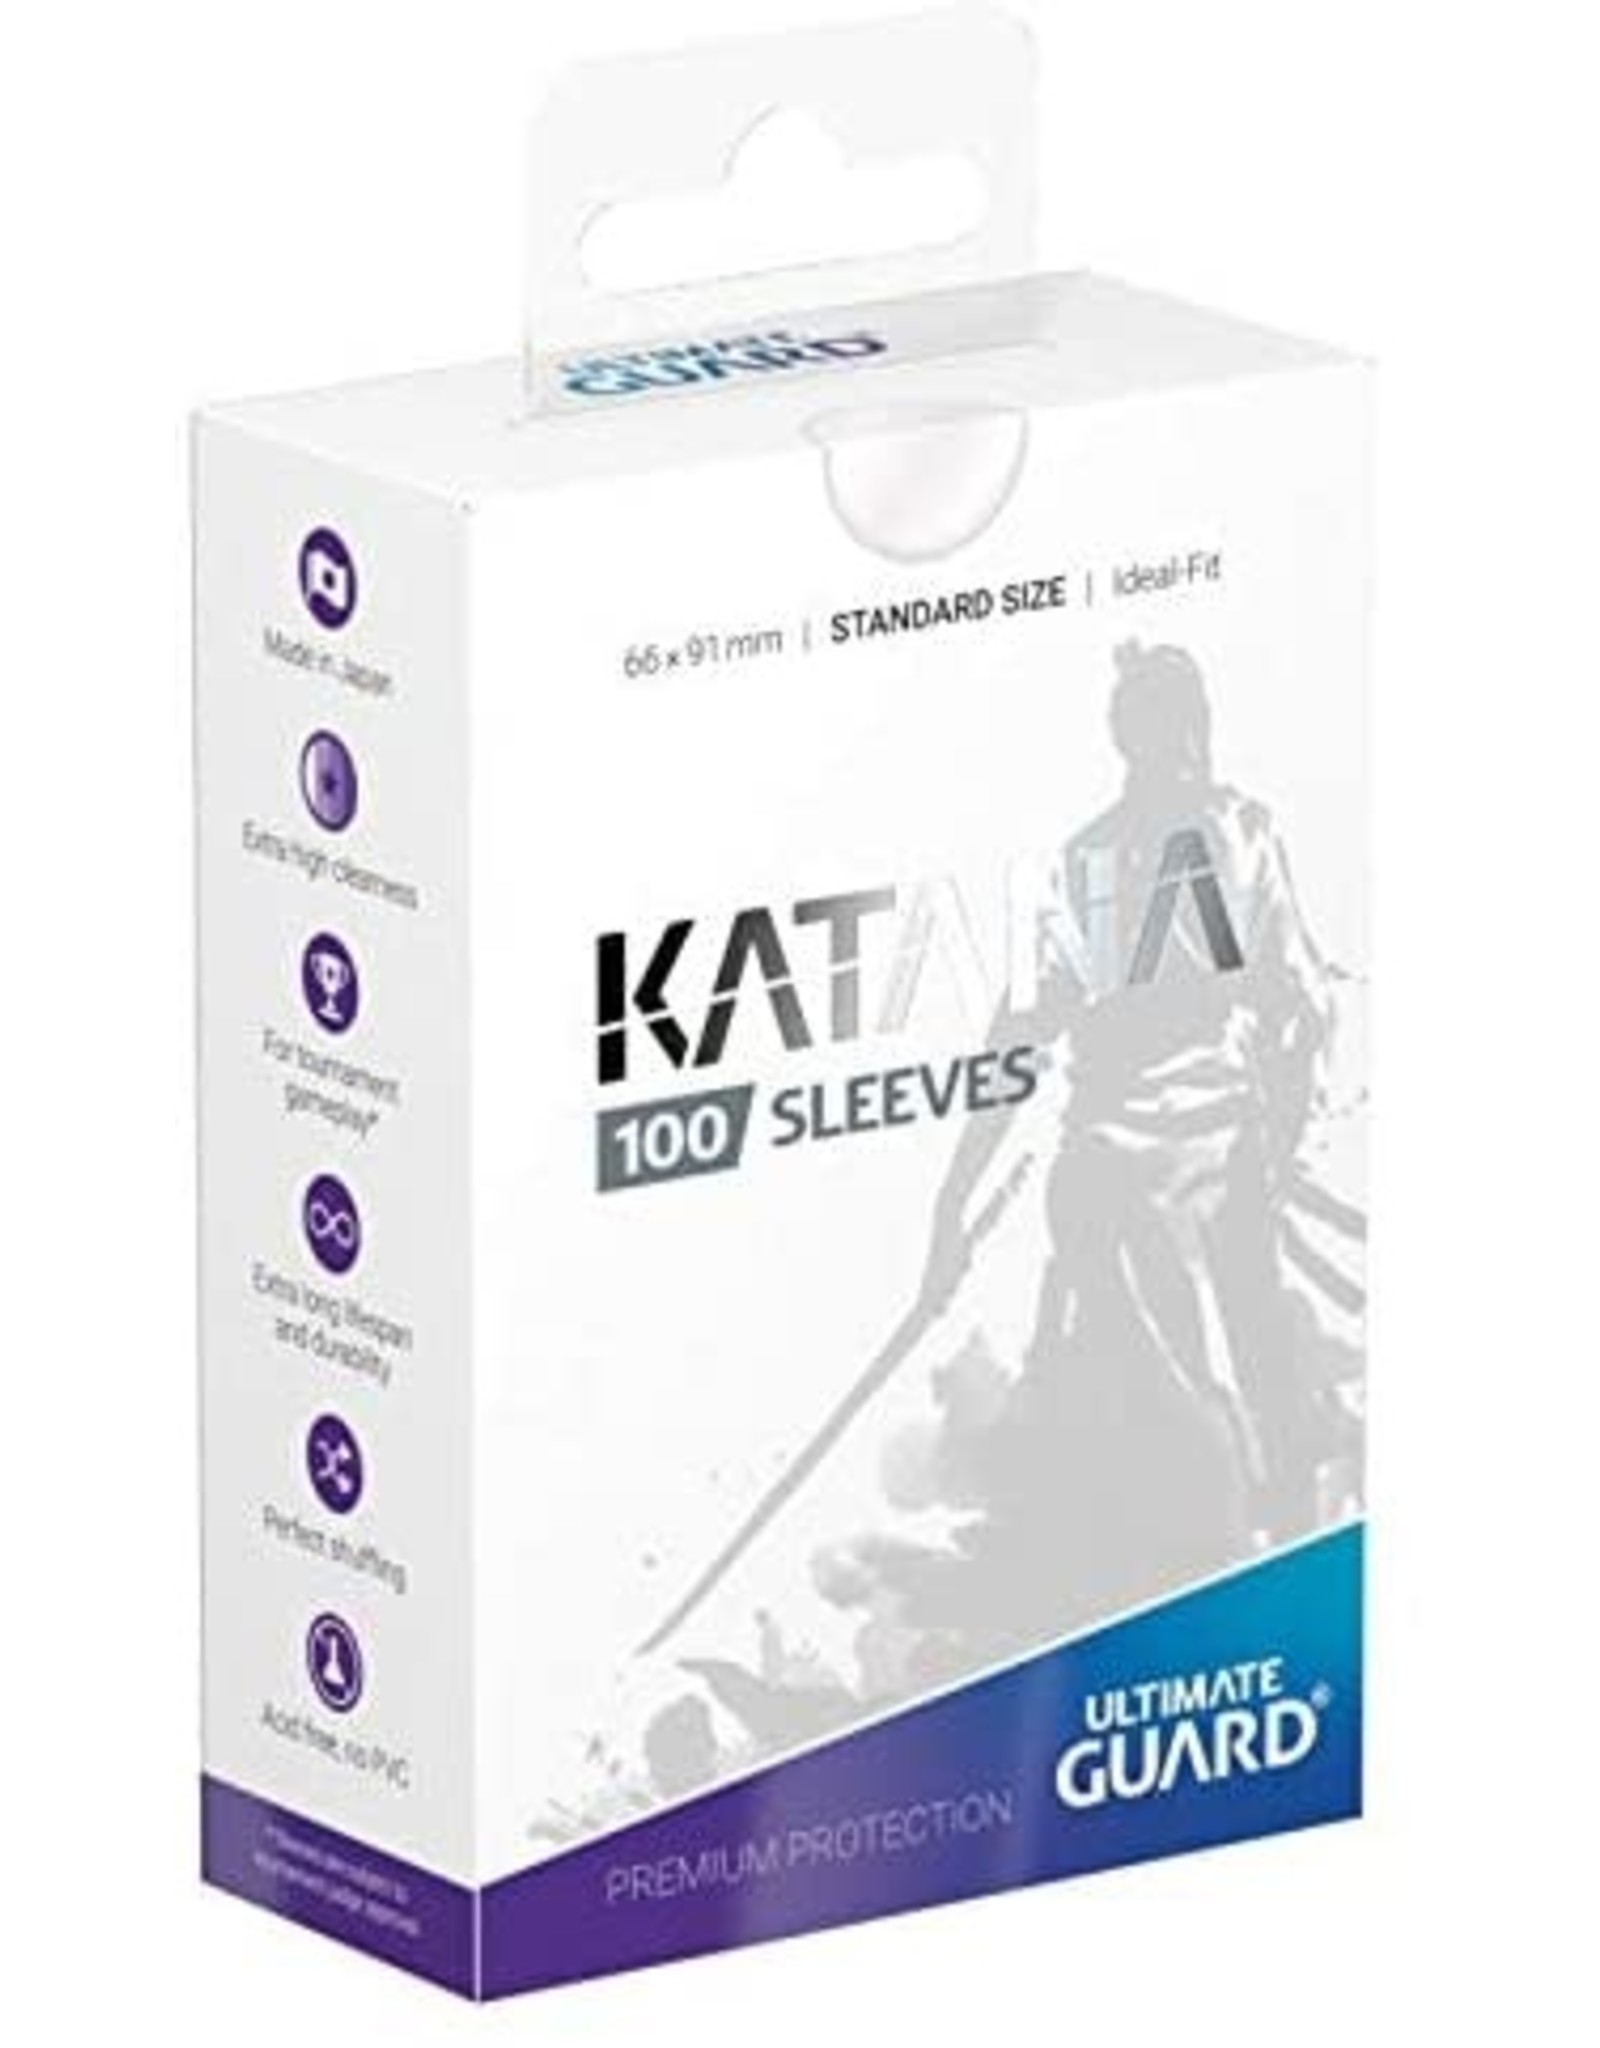 Ultimate Guard Katana Sleeves 100 Transparent